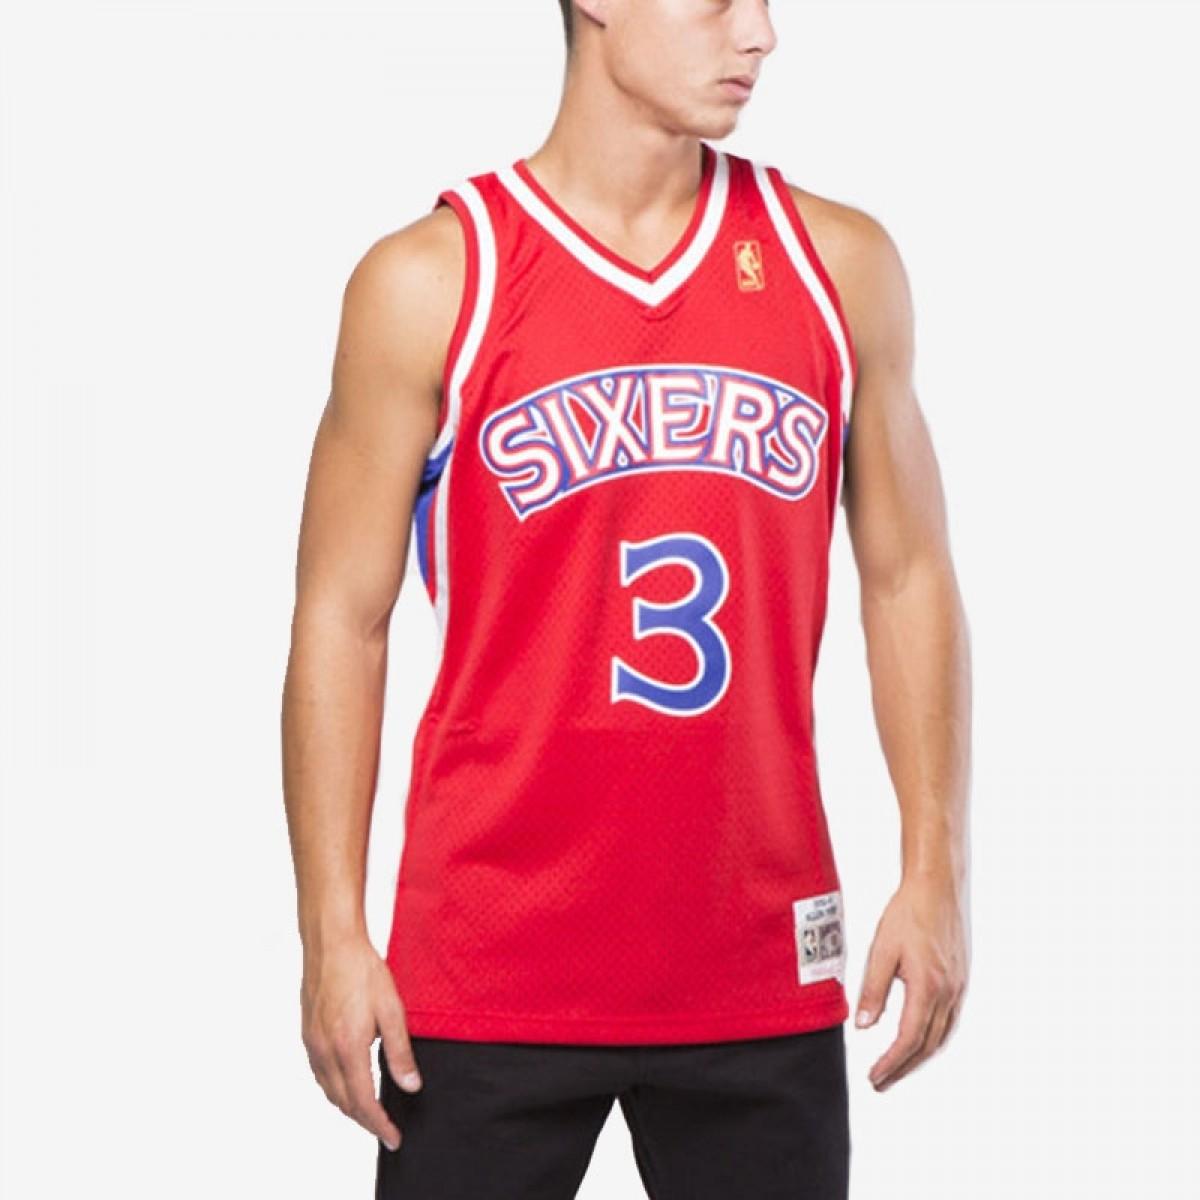 Mitchell & Ness Iverson Swingman Jersey Alternate  'Philadelphia 76ers'